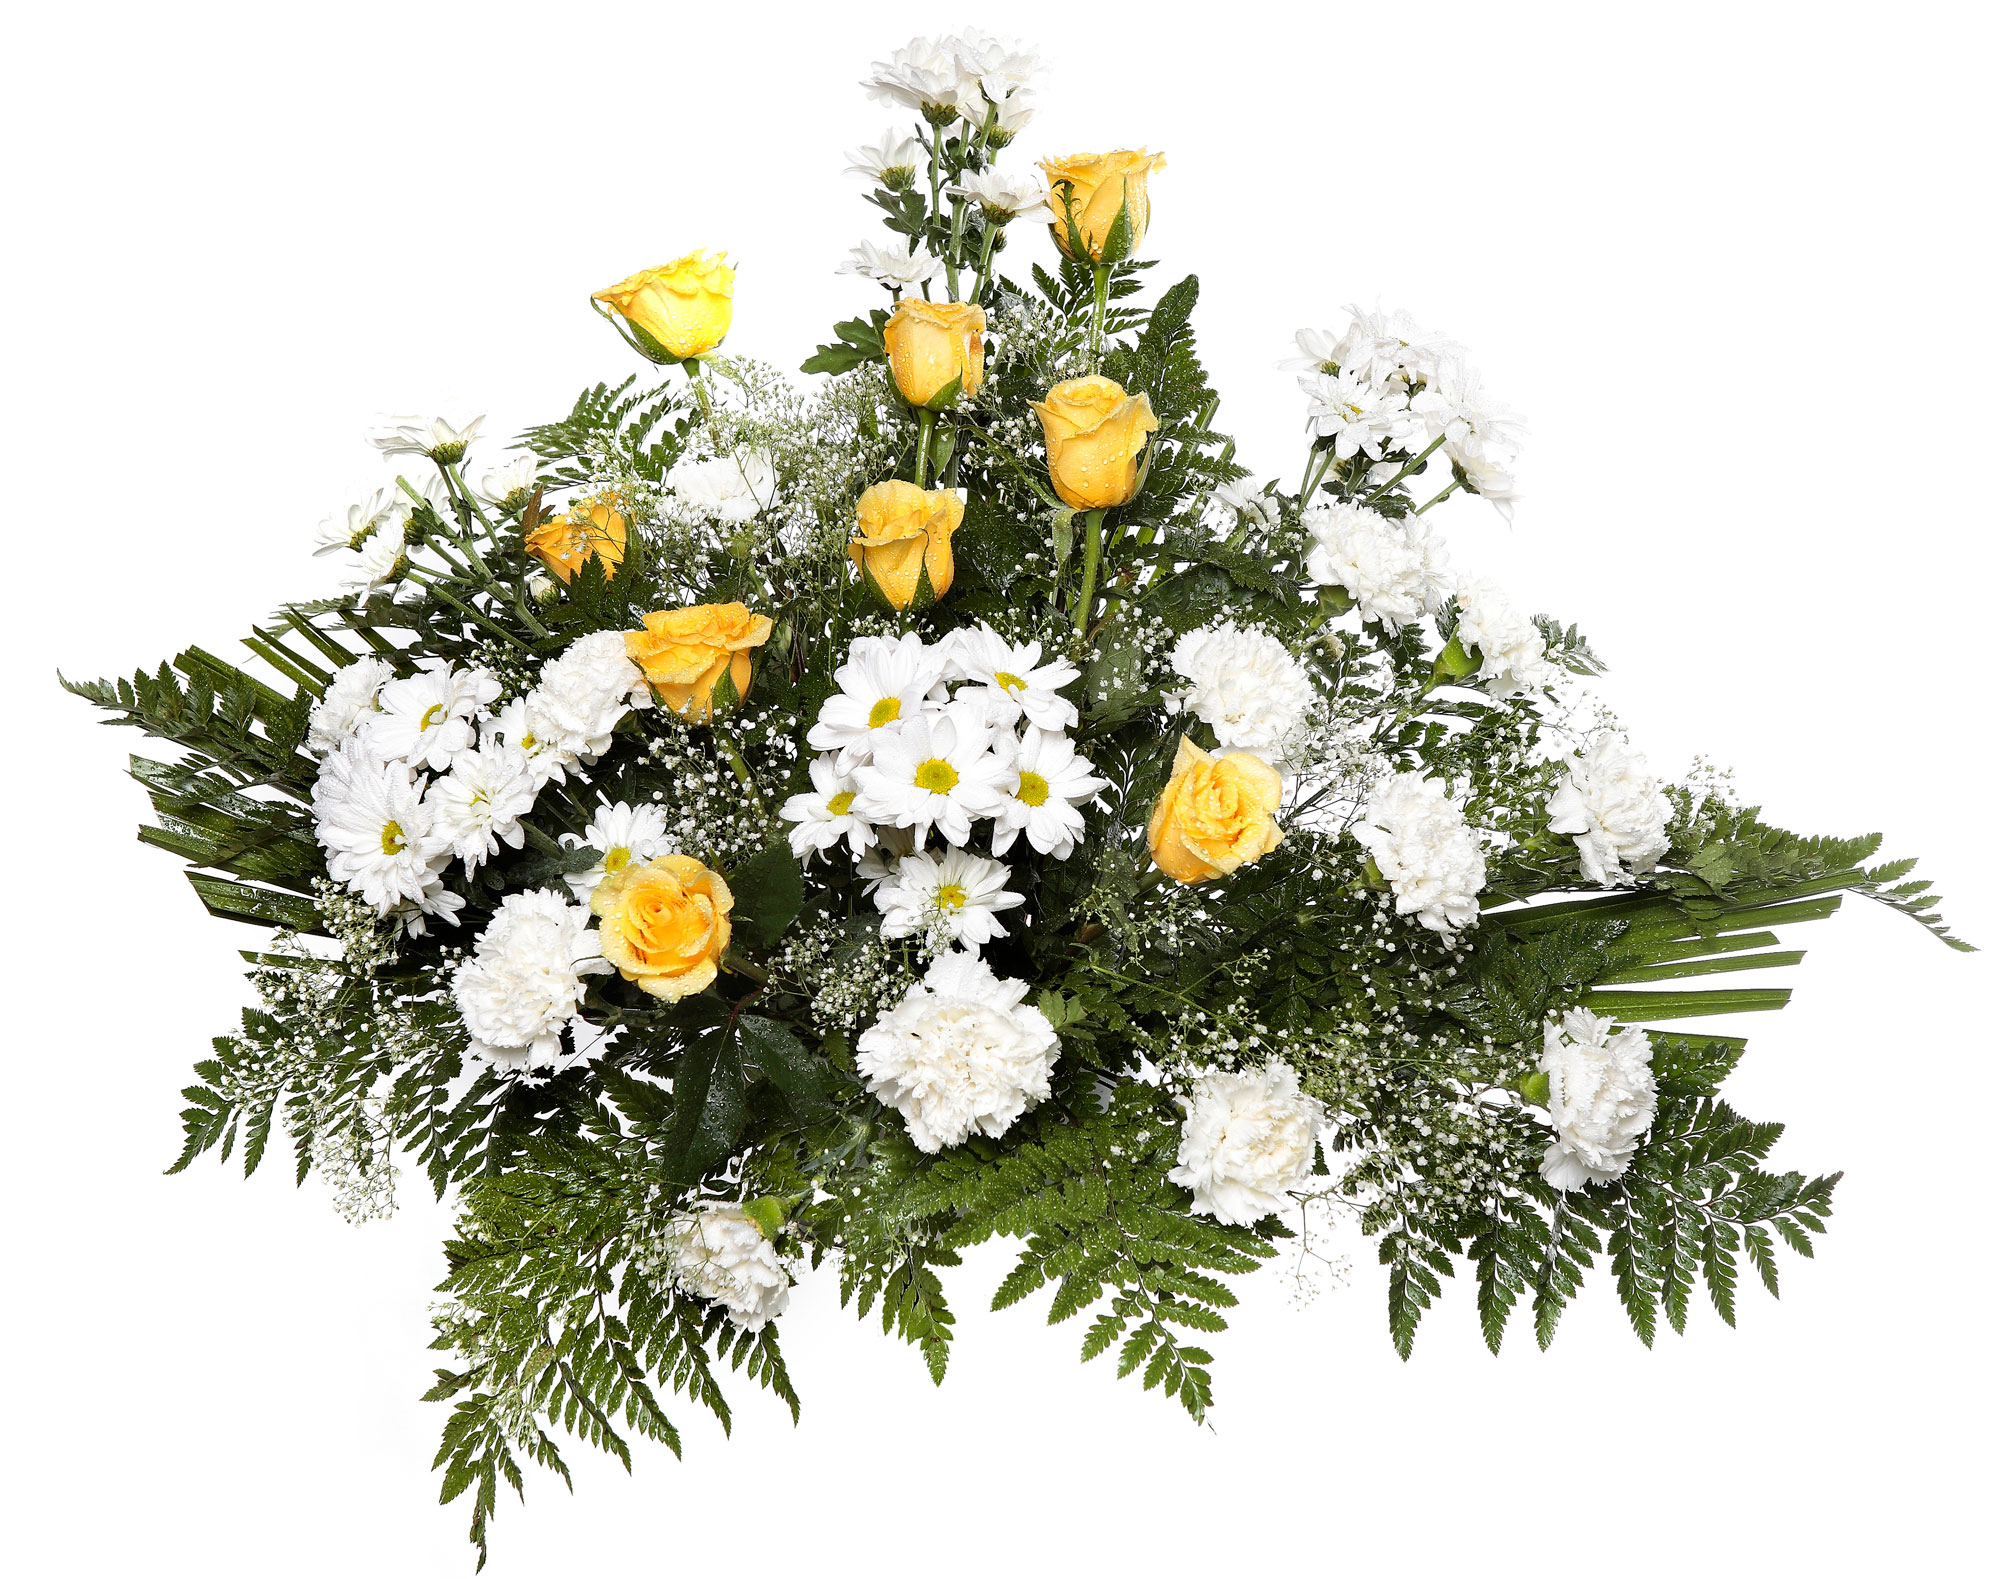 Centro tanatorio 2 detalles flores naturales tienda - Centros de flores naturales ...